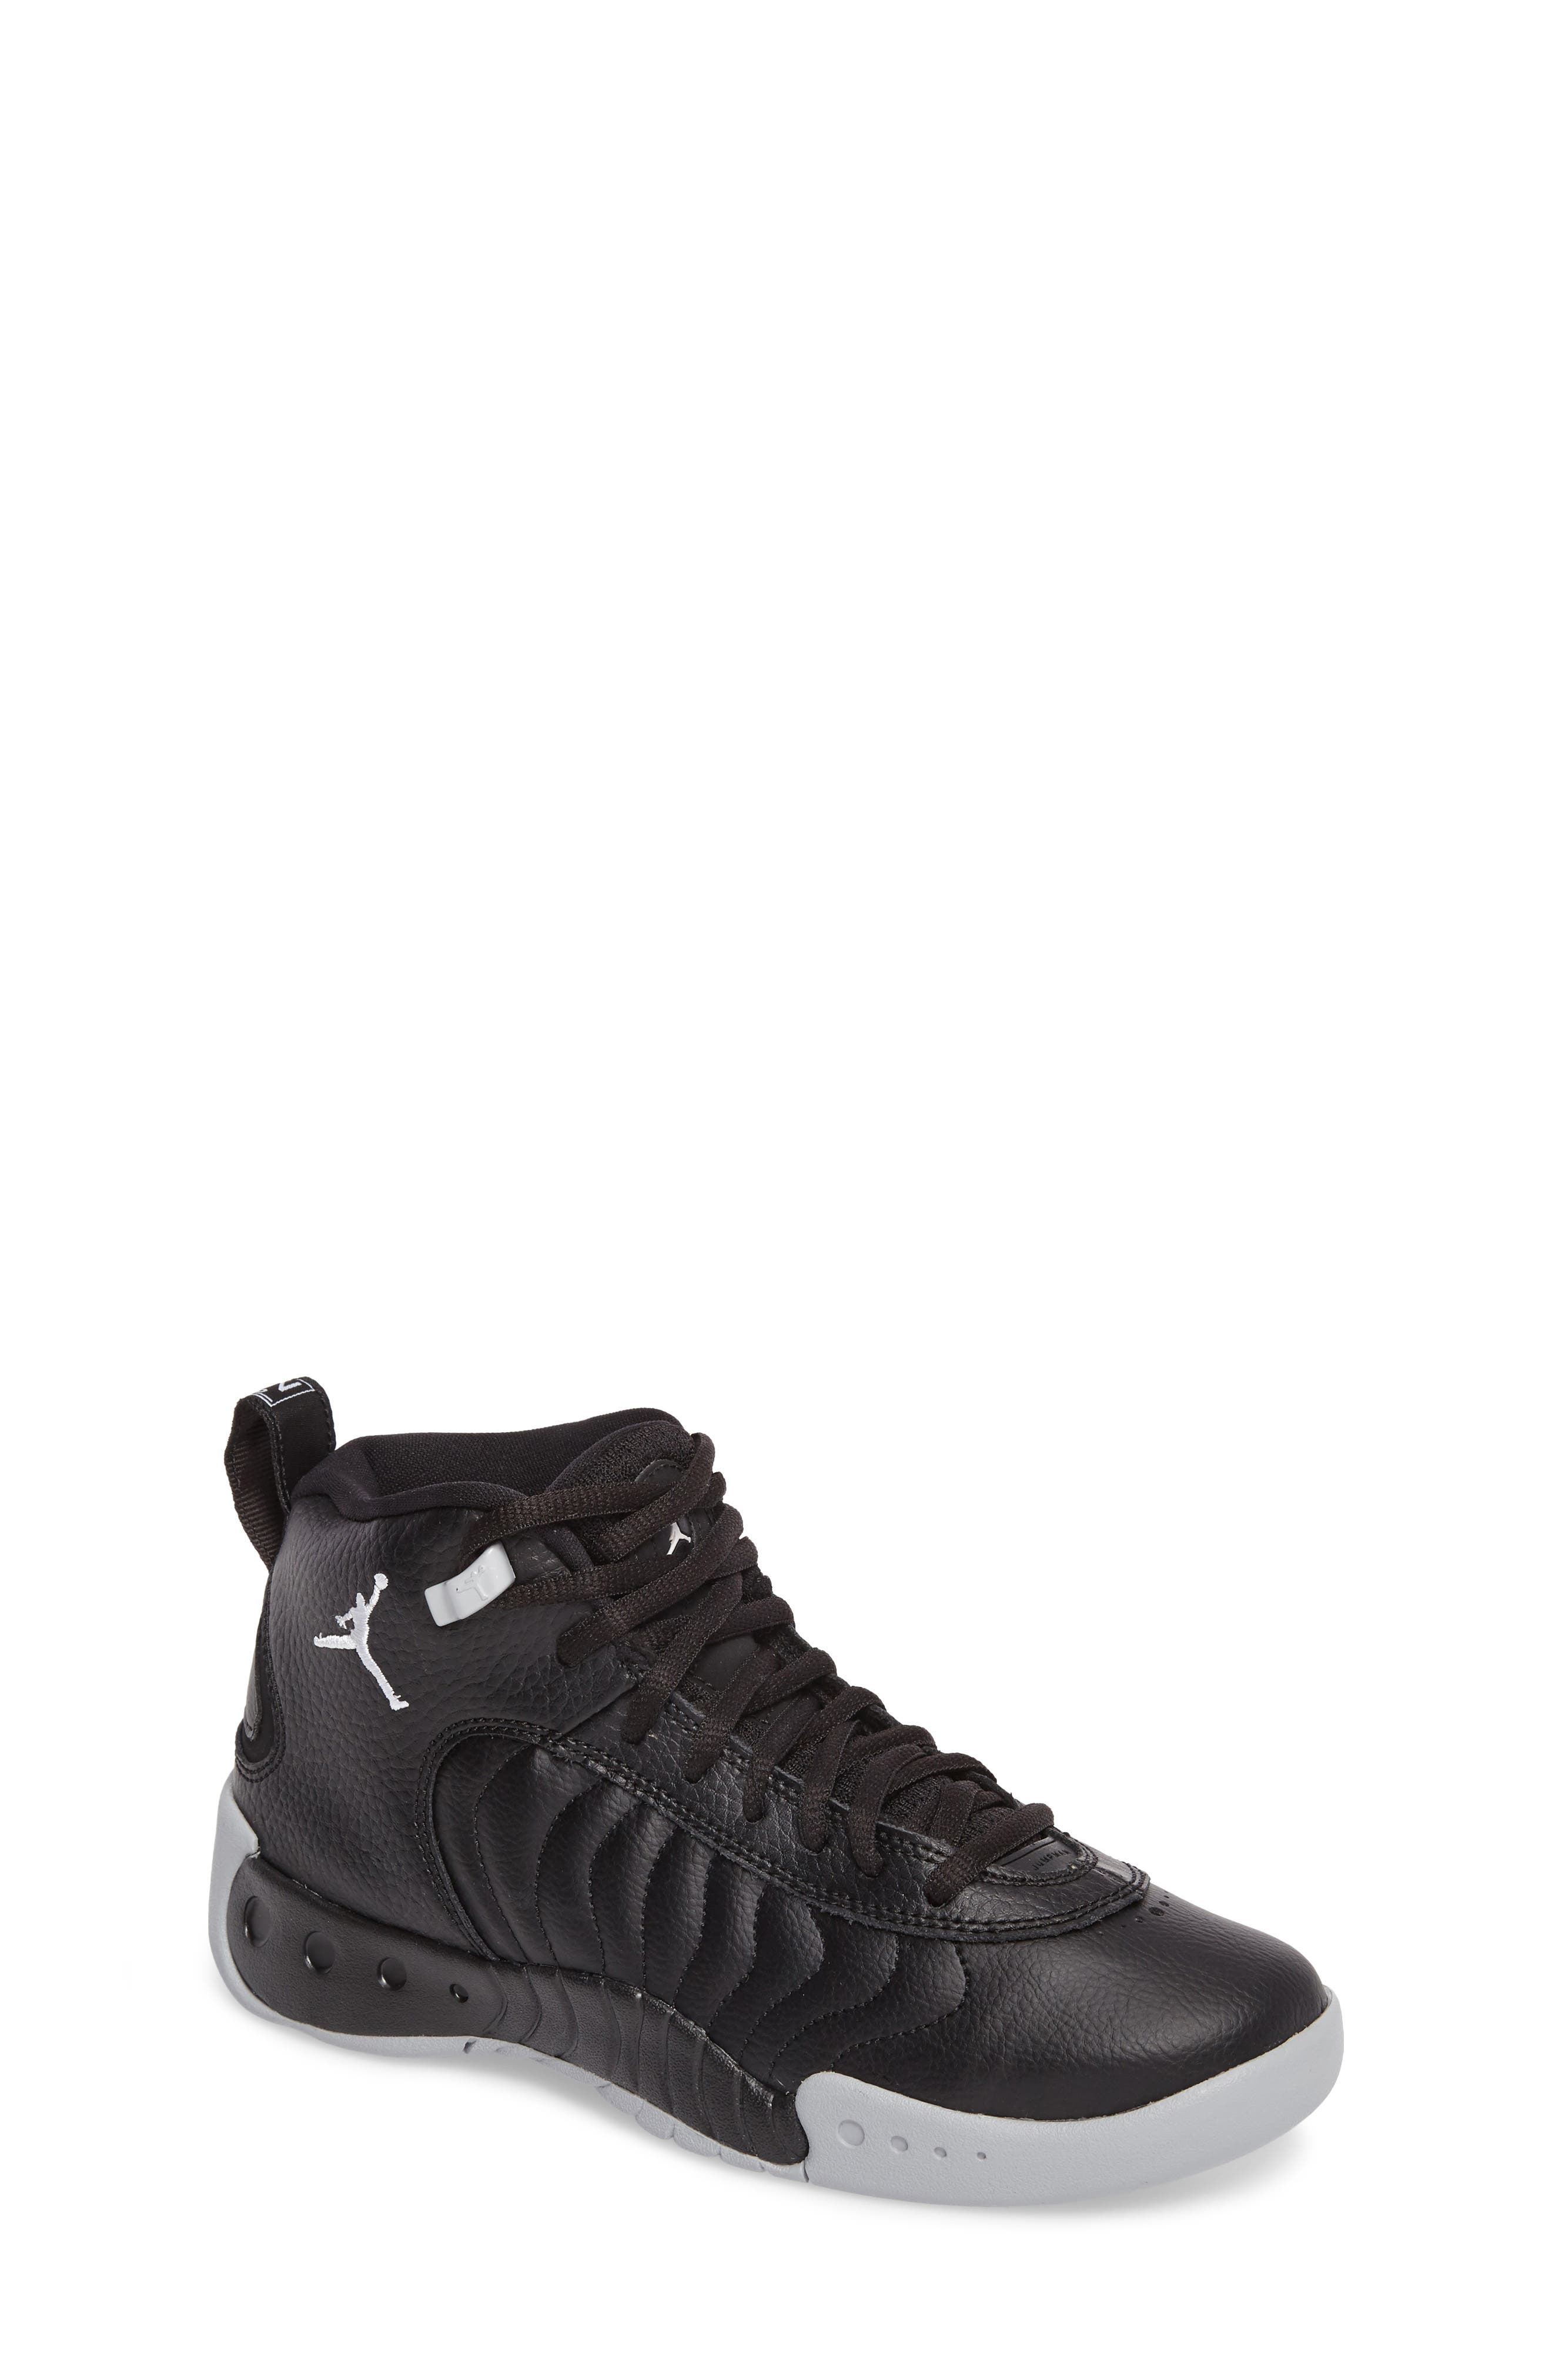 Jumpman Pro BG Mid Top Sneaker,                             Main thumbnail 1, color,                             012